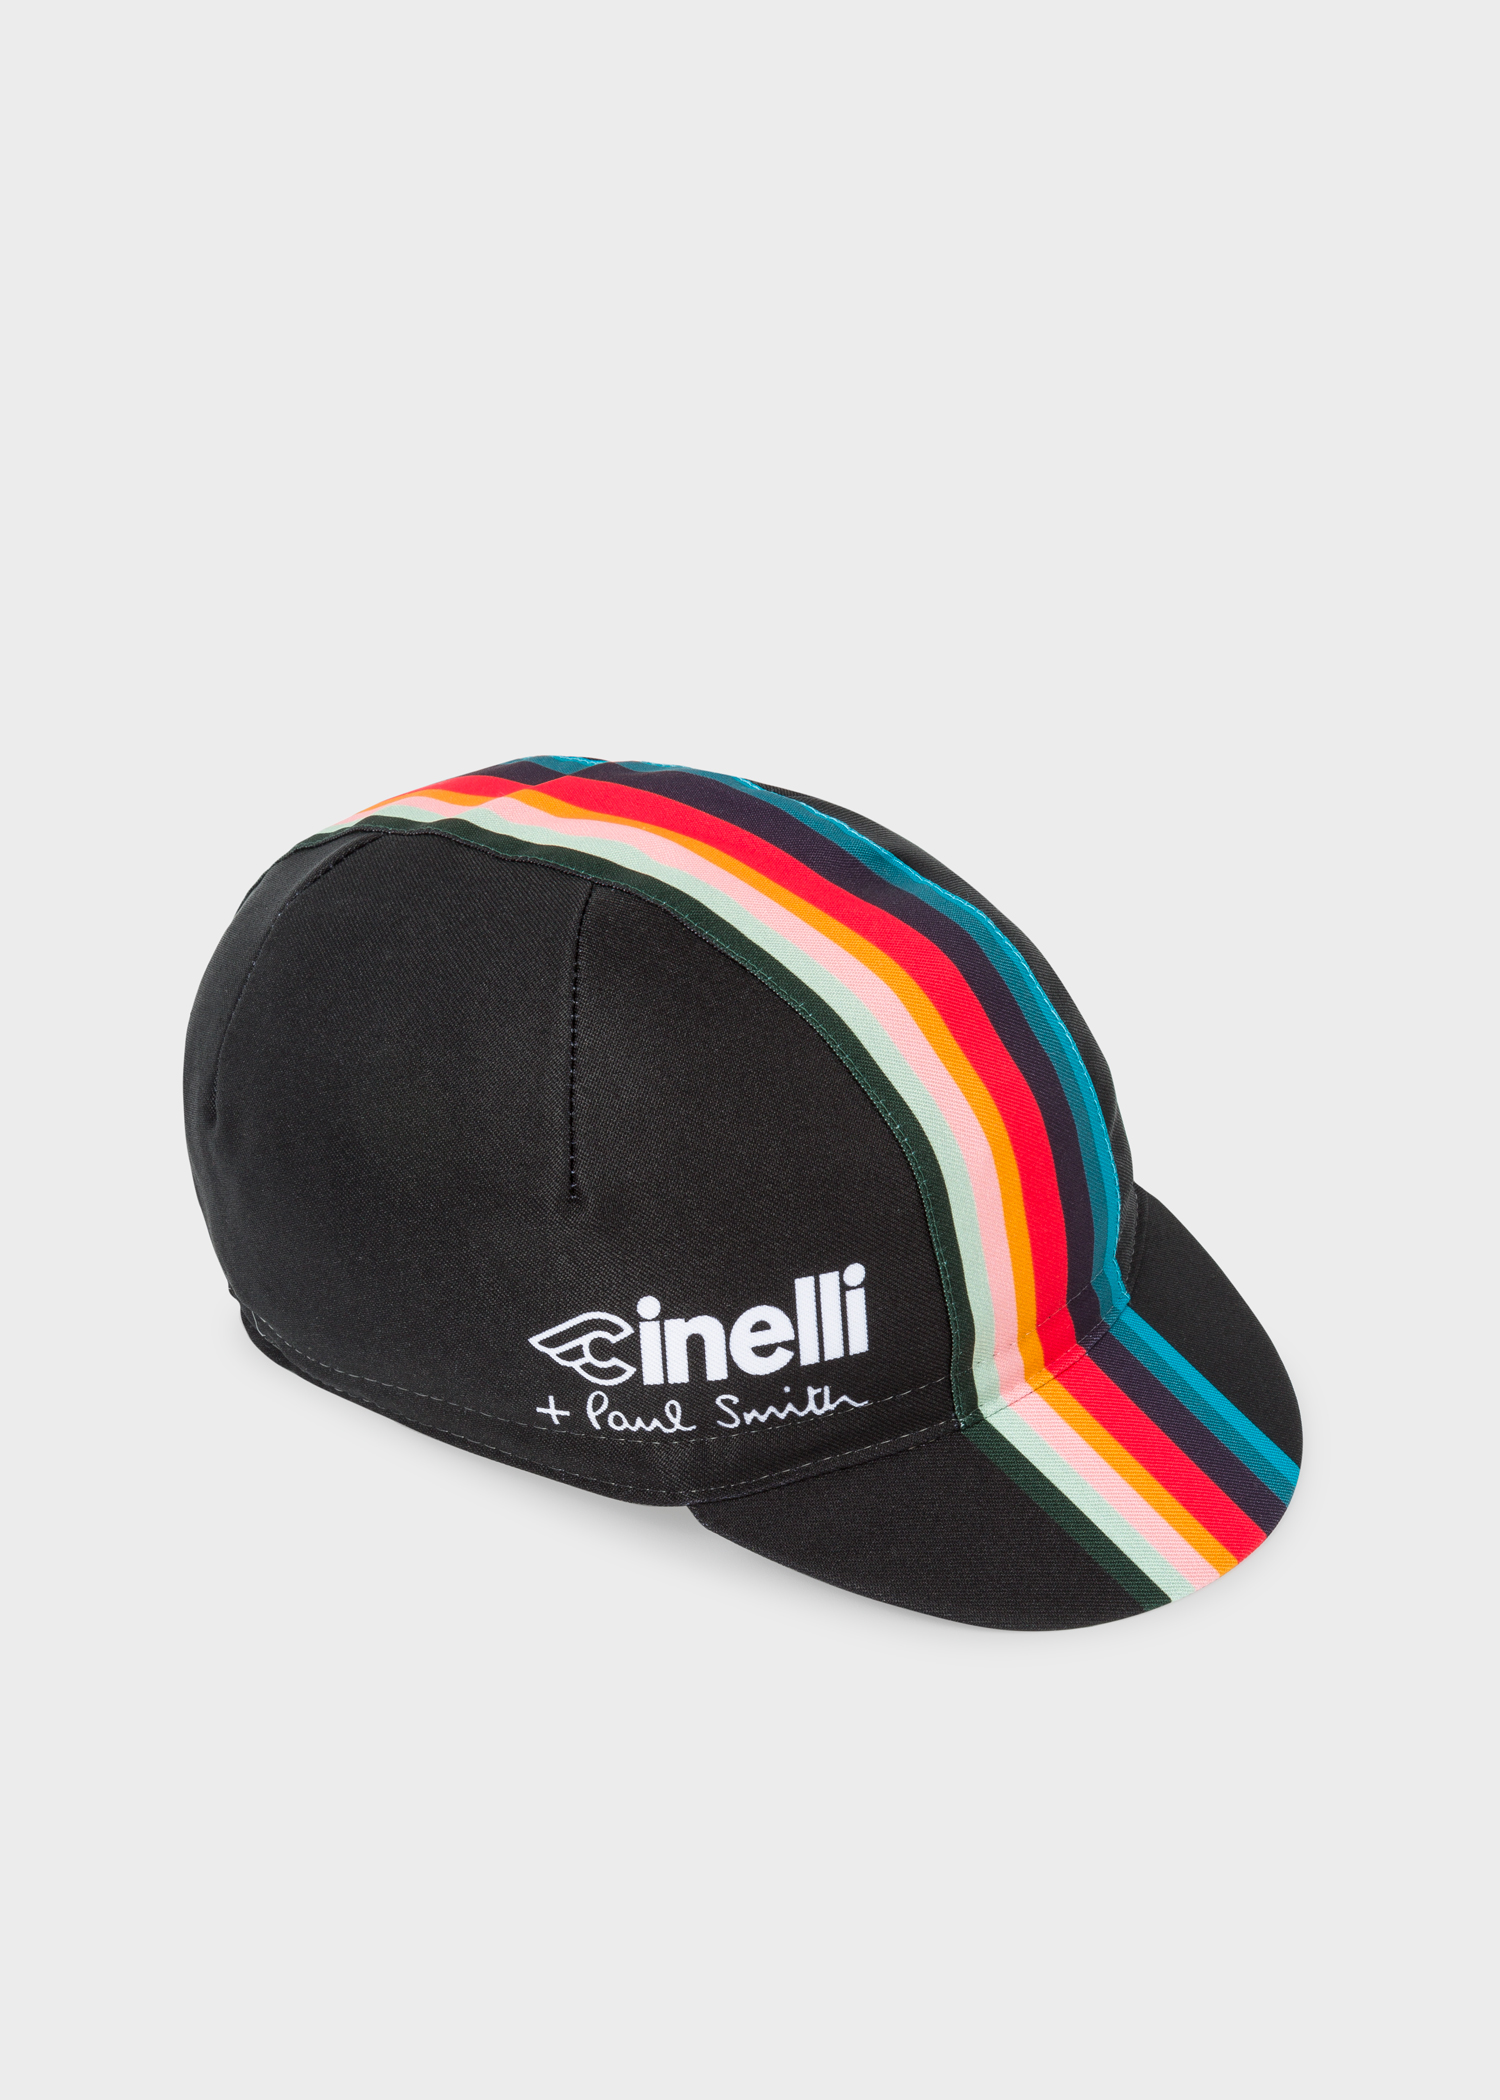 Paul Smith + Cinelli Black  Artist Stripe  Band Cycling Cap - Paul ... 8b7b5477986